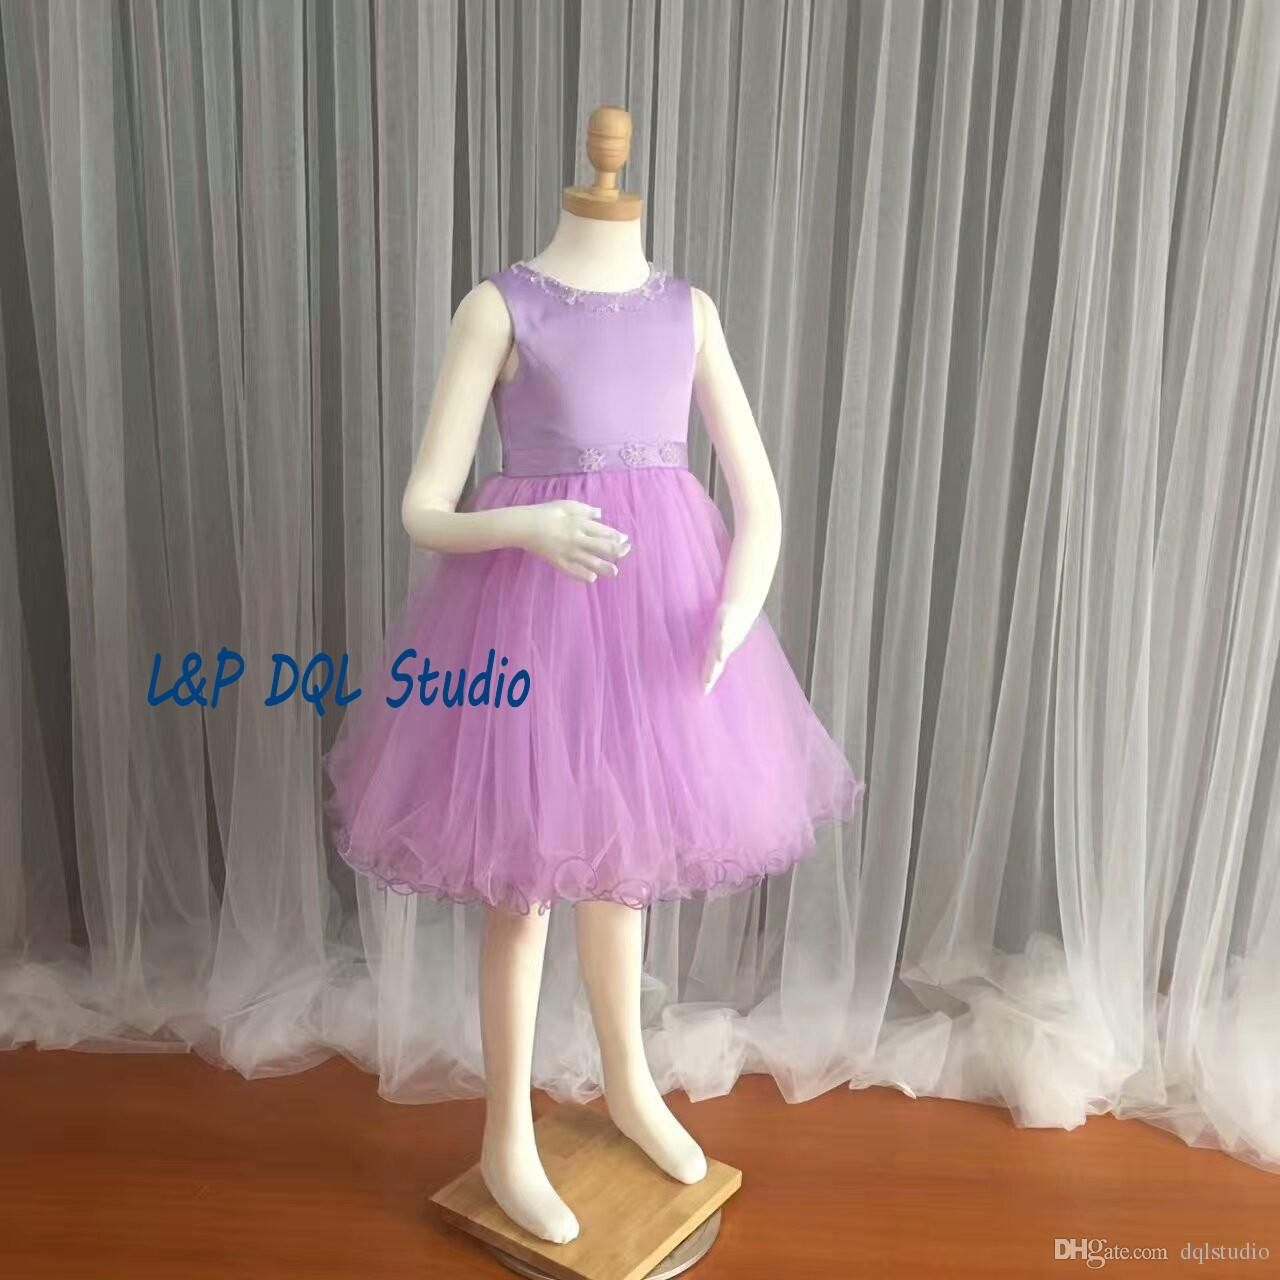 Light purple flower girls dresses pleats tulle with satin ball gown light purple flower girls dresses pleats tulle with satin ball gown girls pagenat dresses cheap real izmirmasajfo